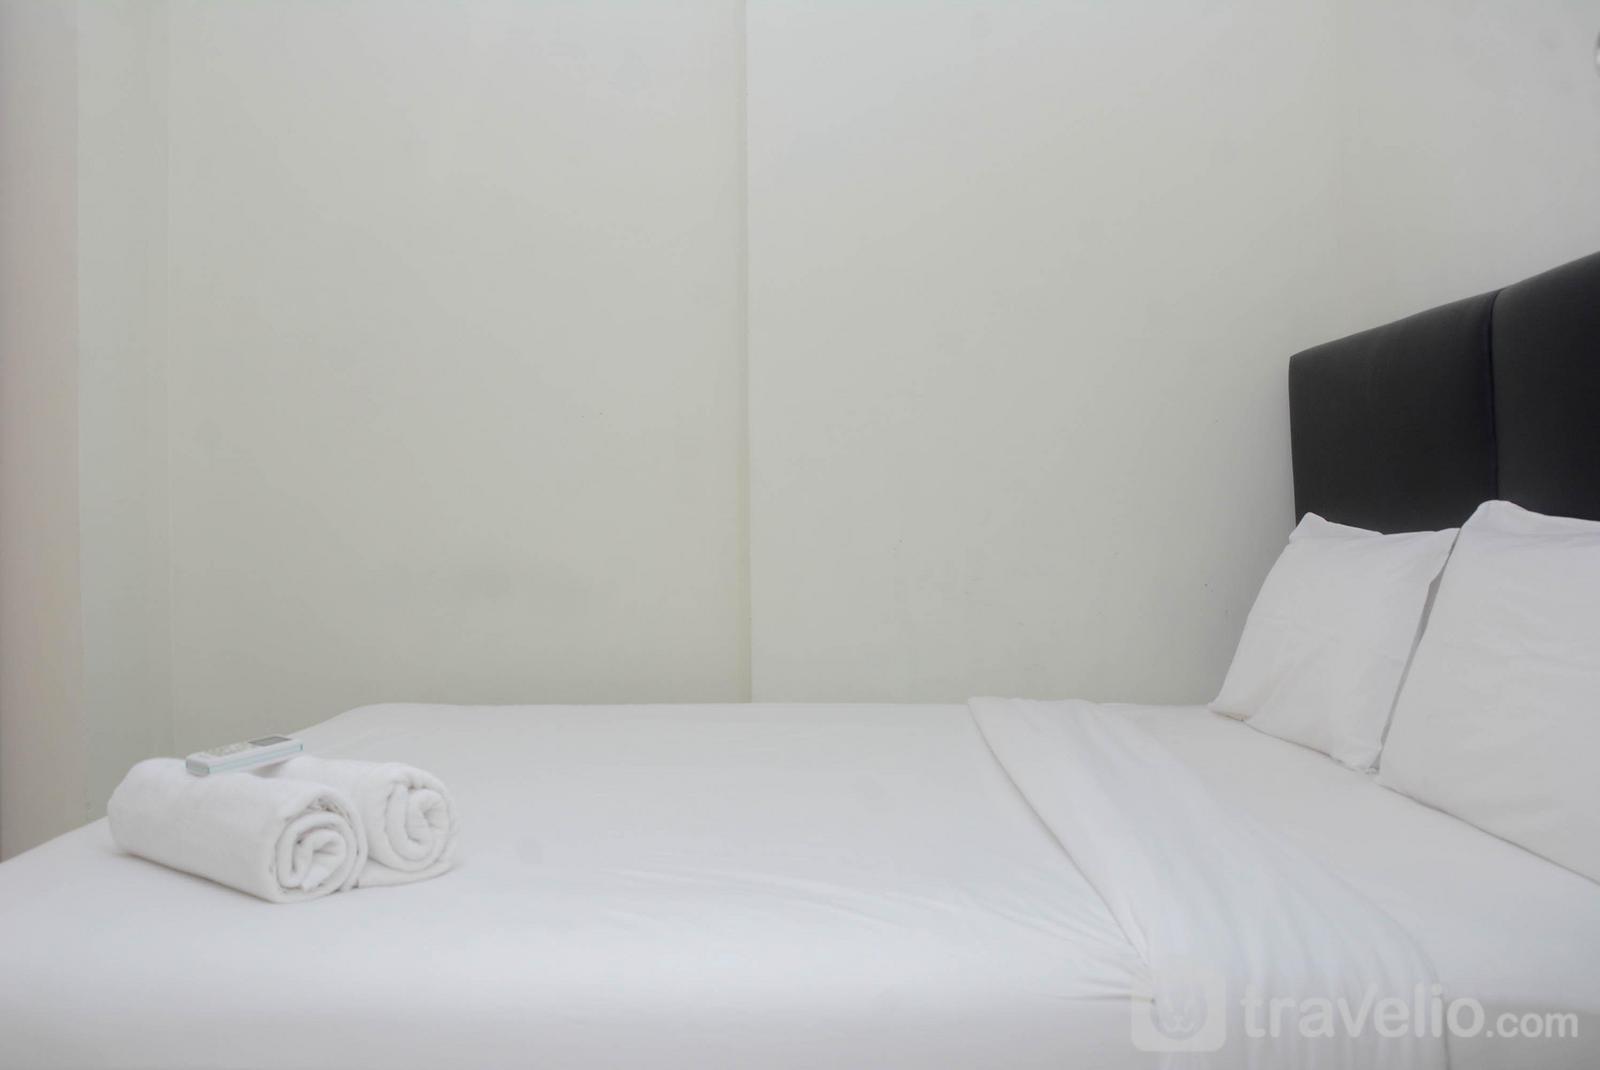 Apartemen Kalibata City - Solace 2BR at Kalibata City Apartment By Travelio